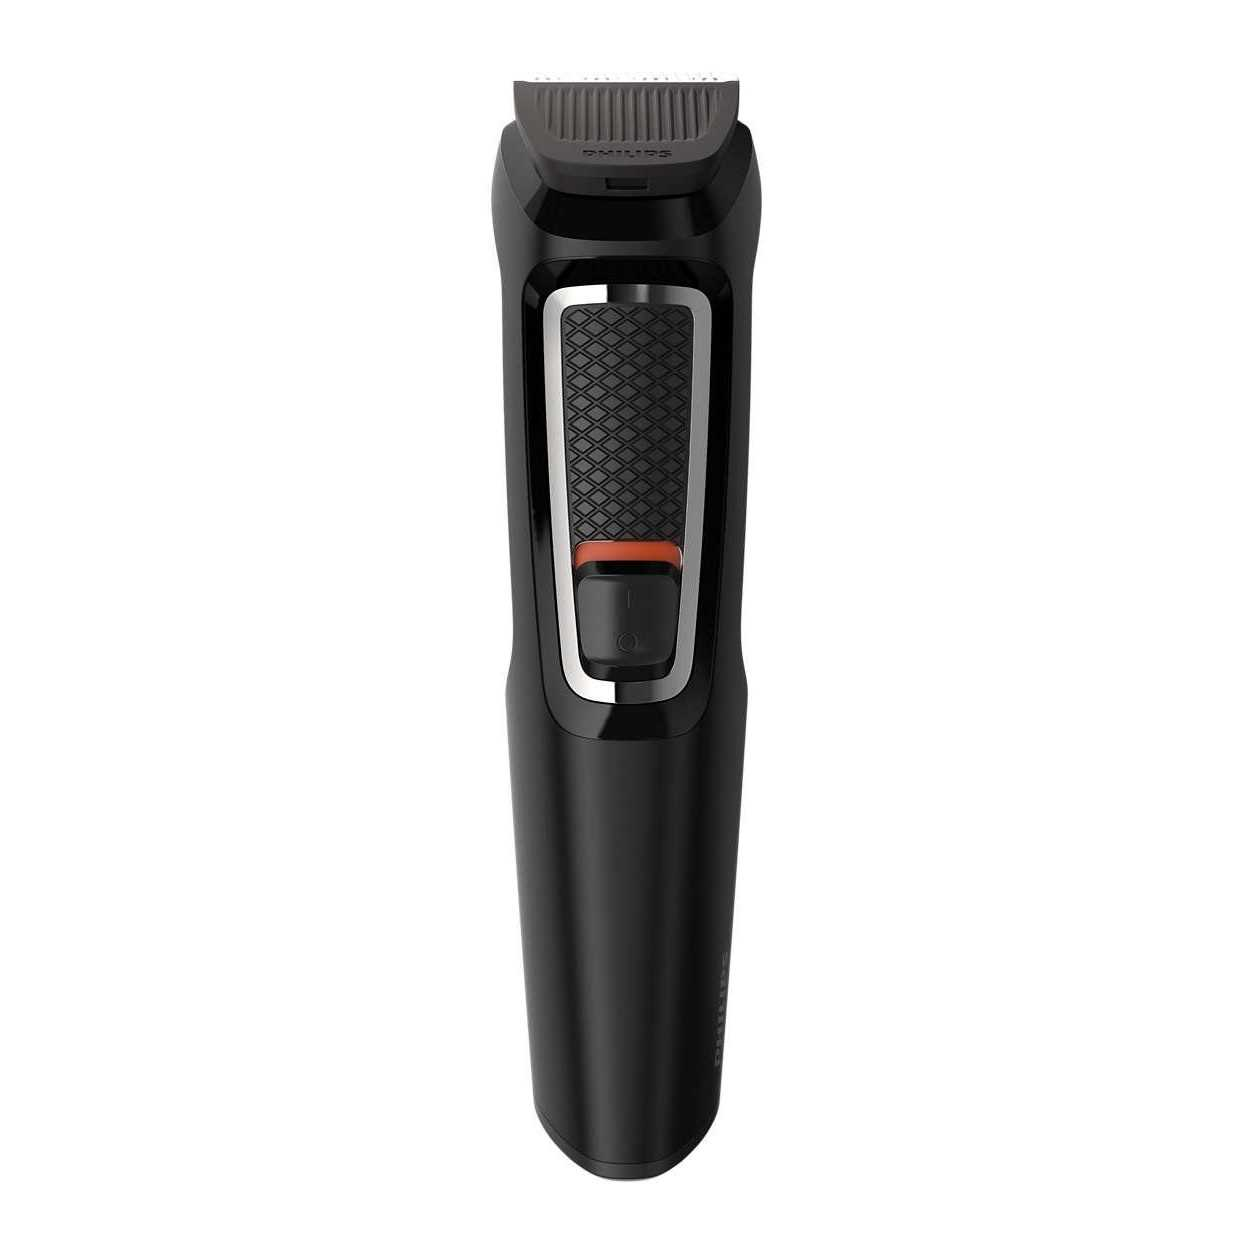 Philips MG3730/15 Grooming Kit